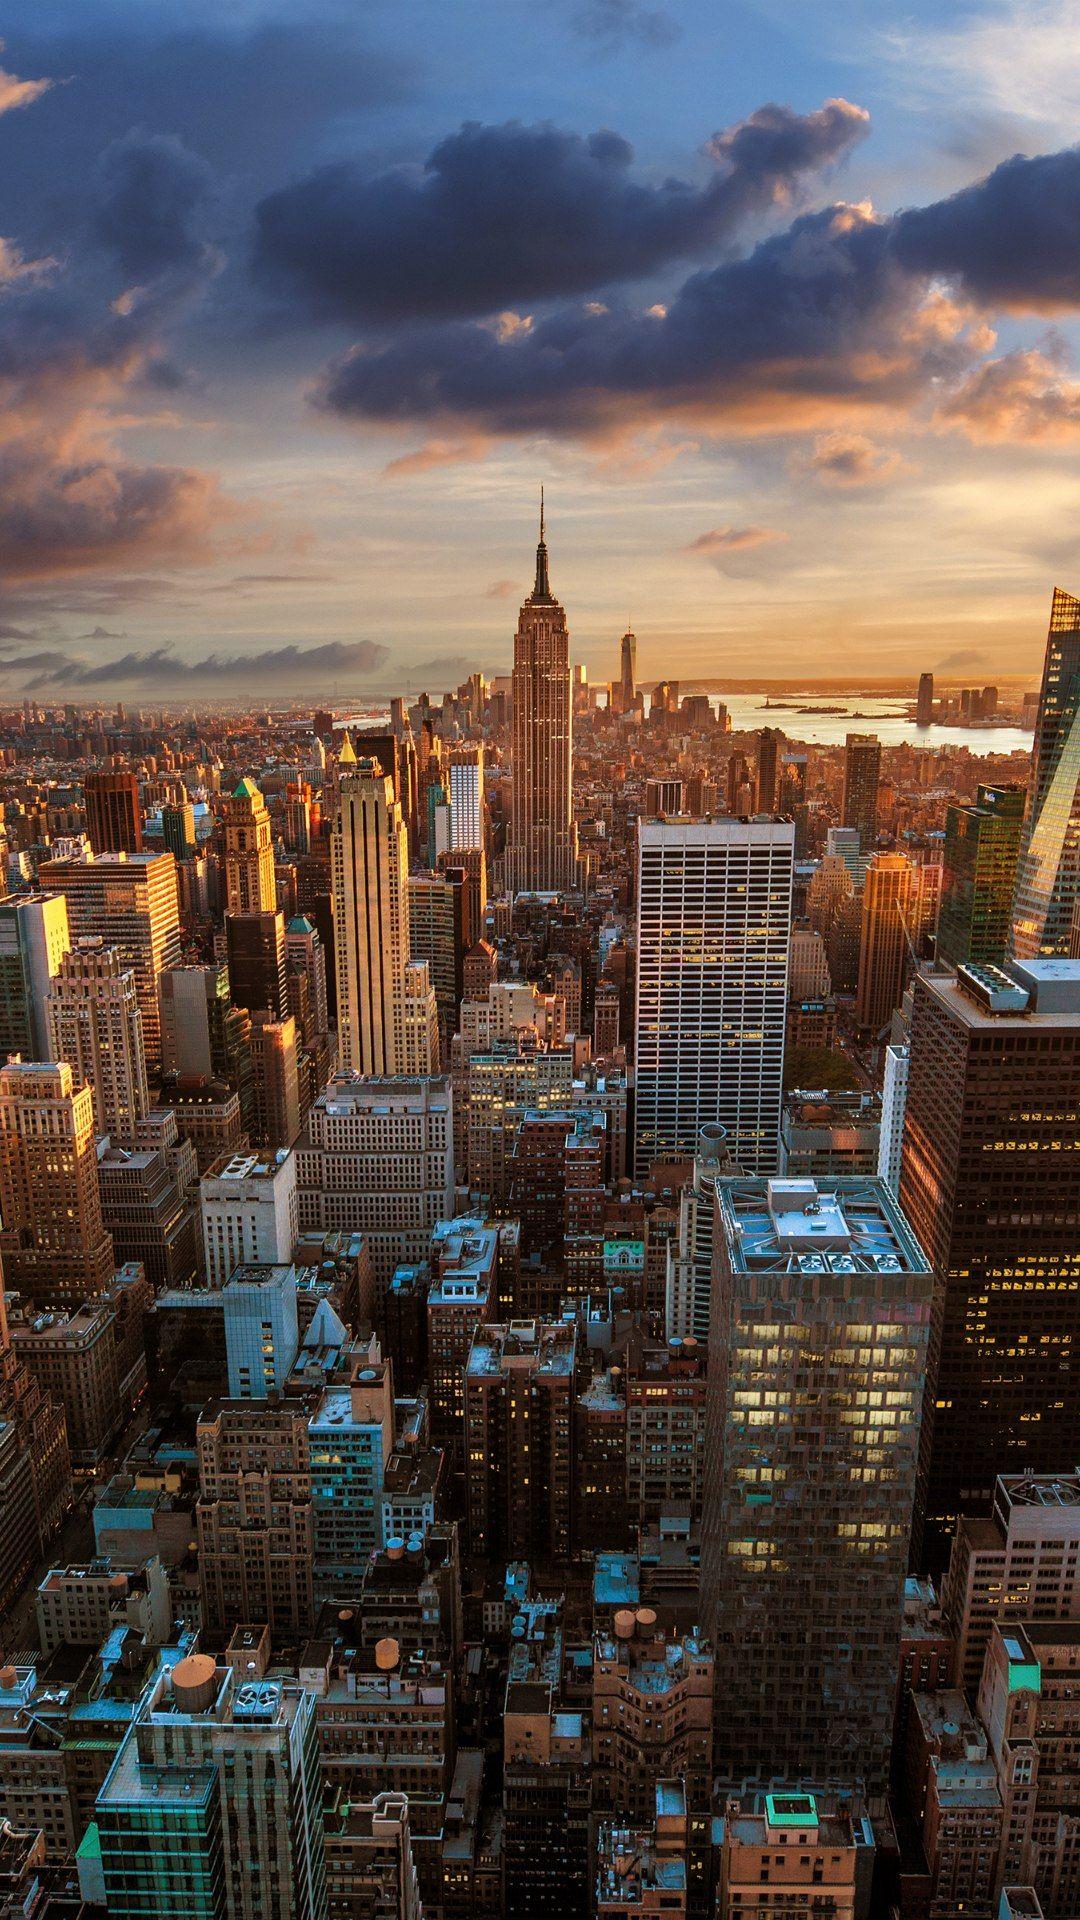 New York City Sunset New York Wallpaper City Wallpaper York Wallpaper